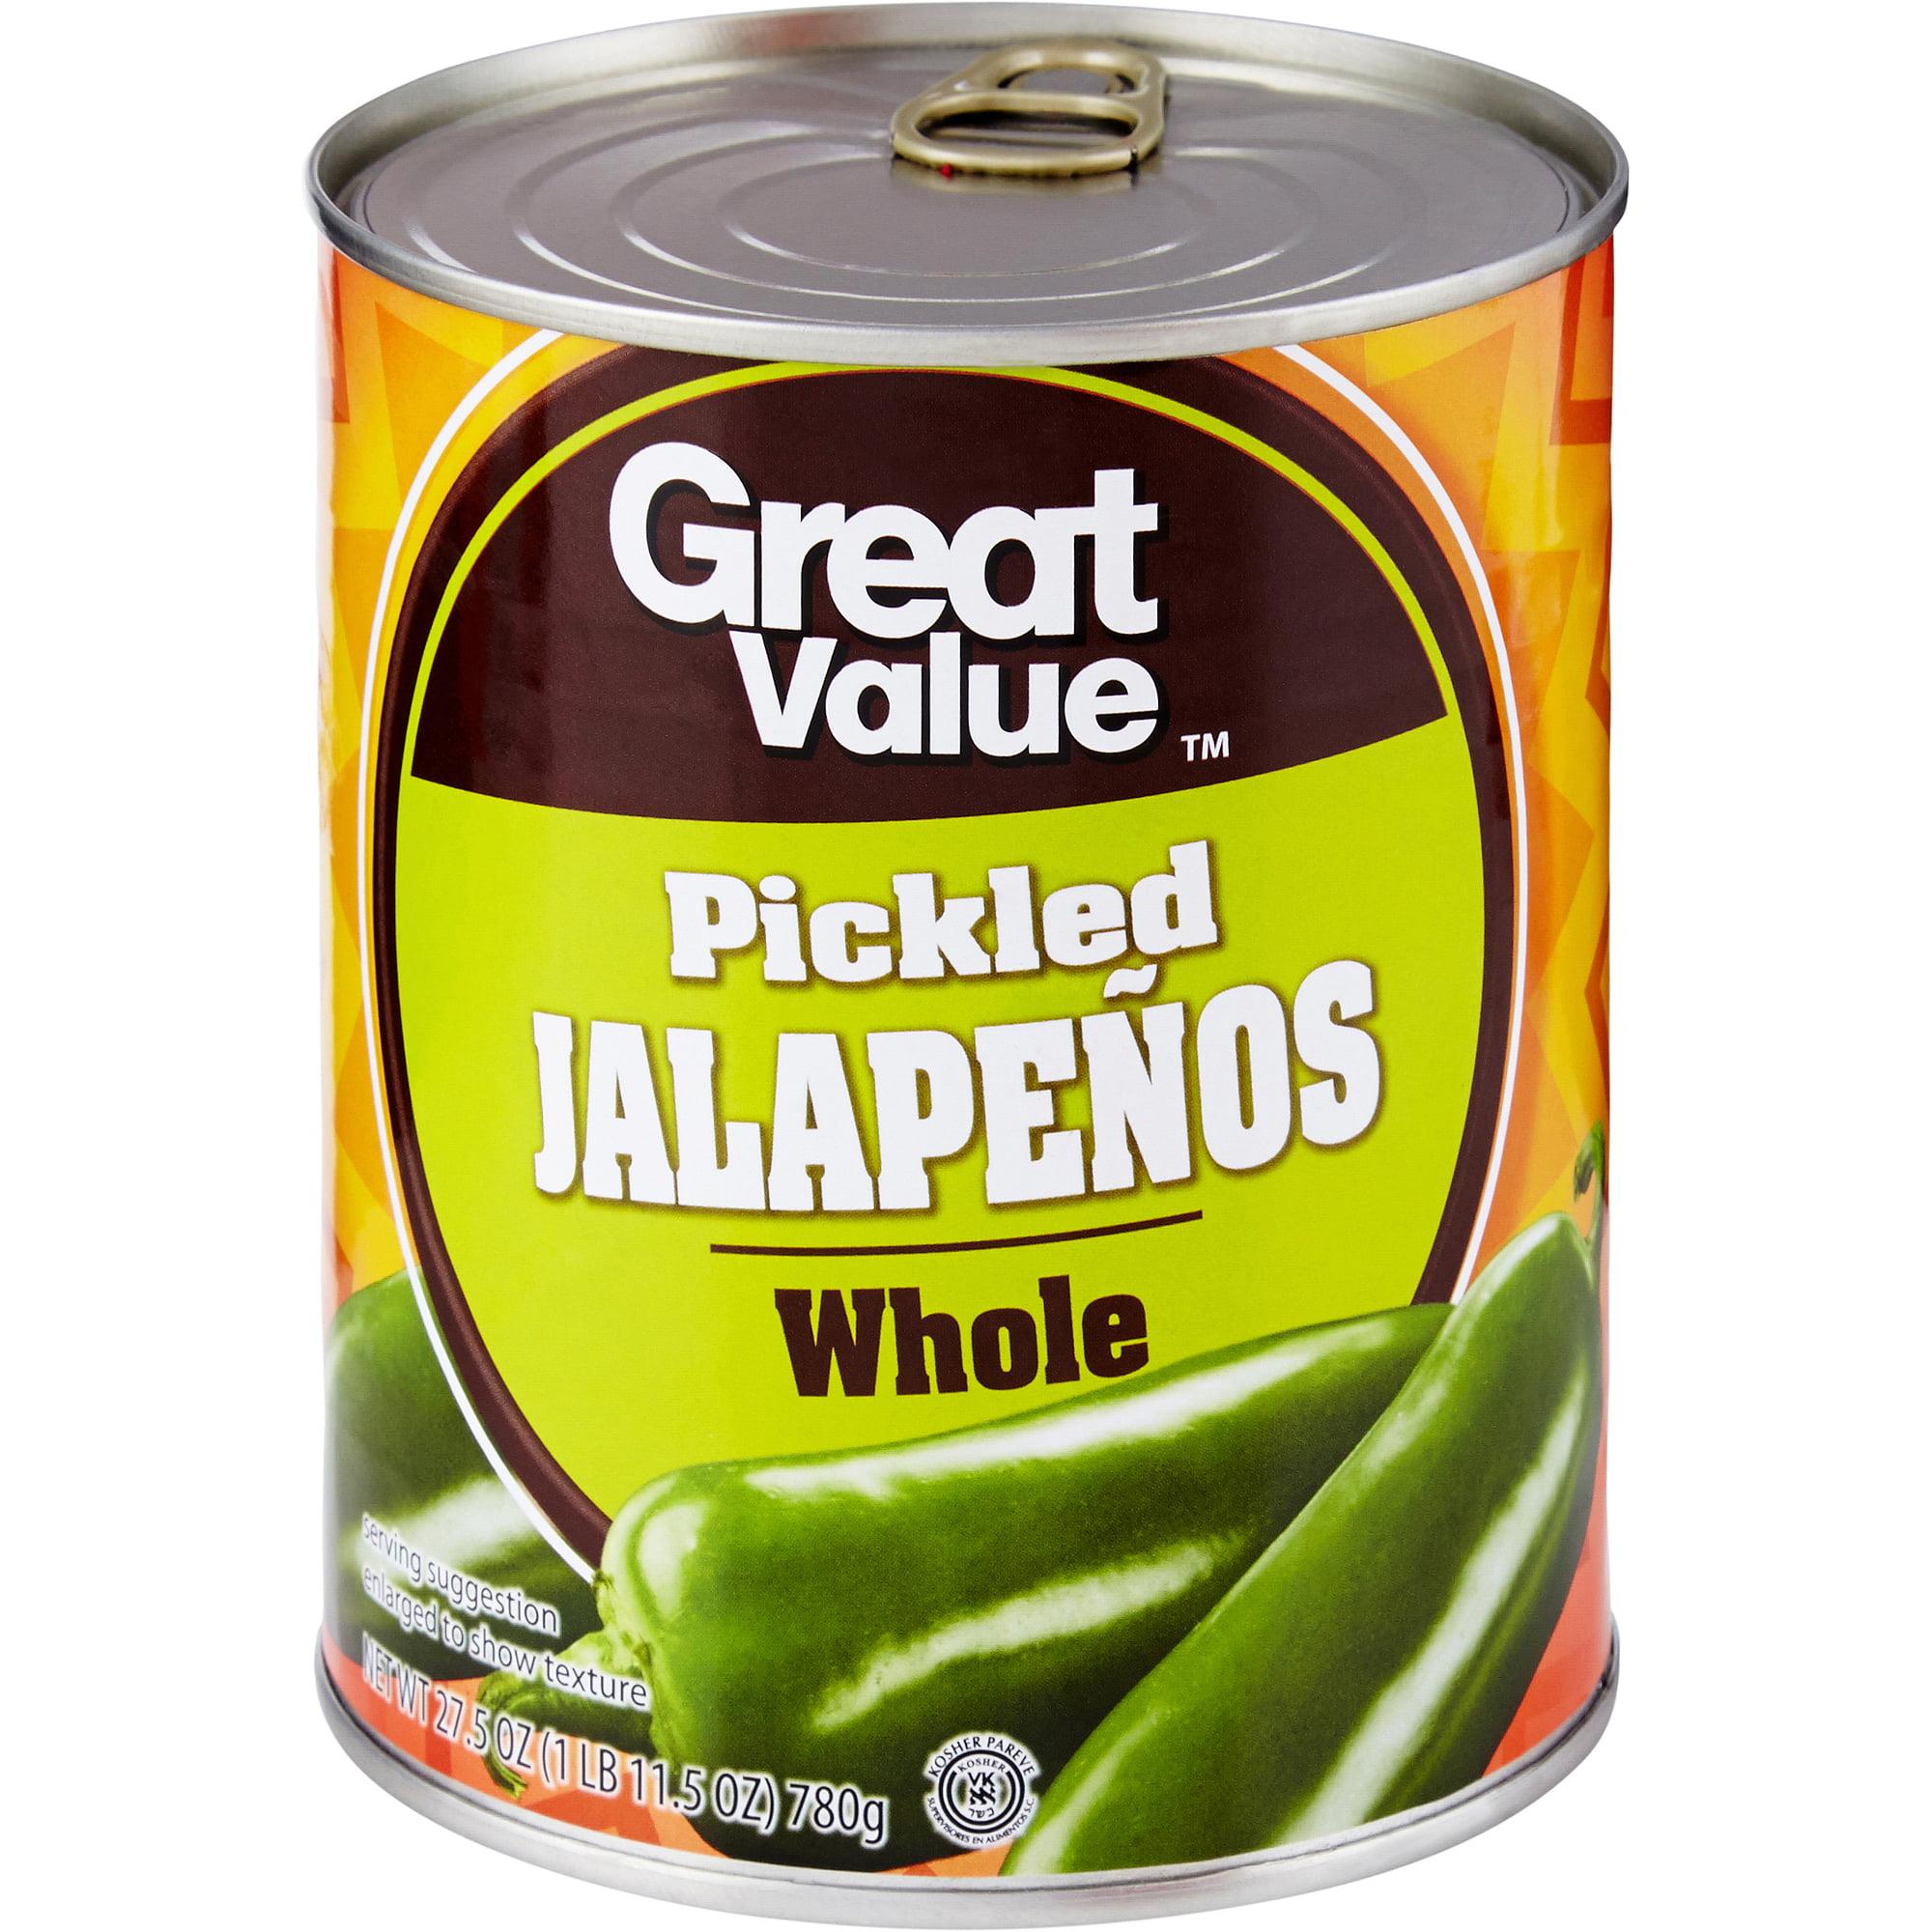 Great Value Whole Jalapenos, 27.5 oz